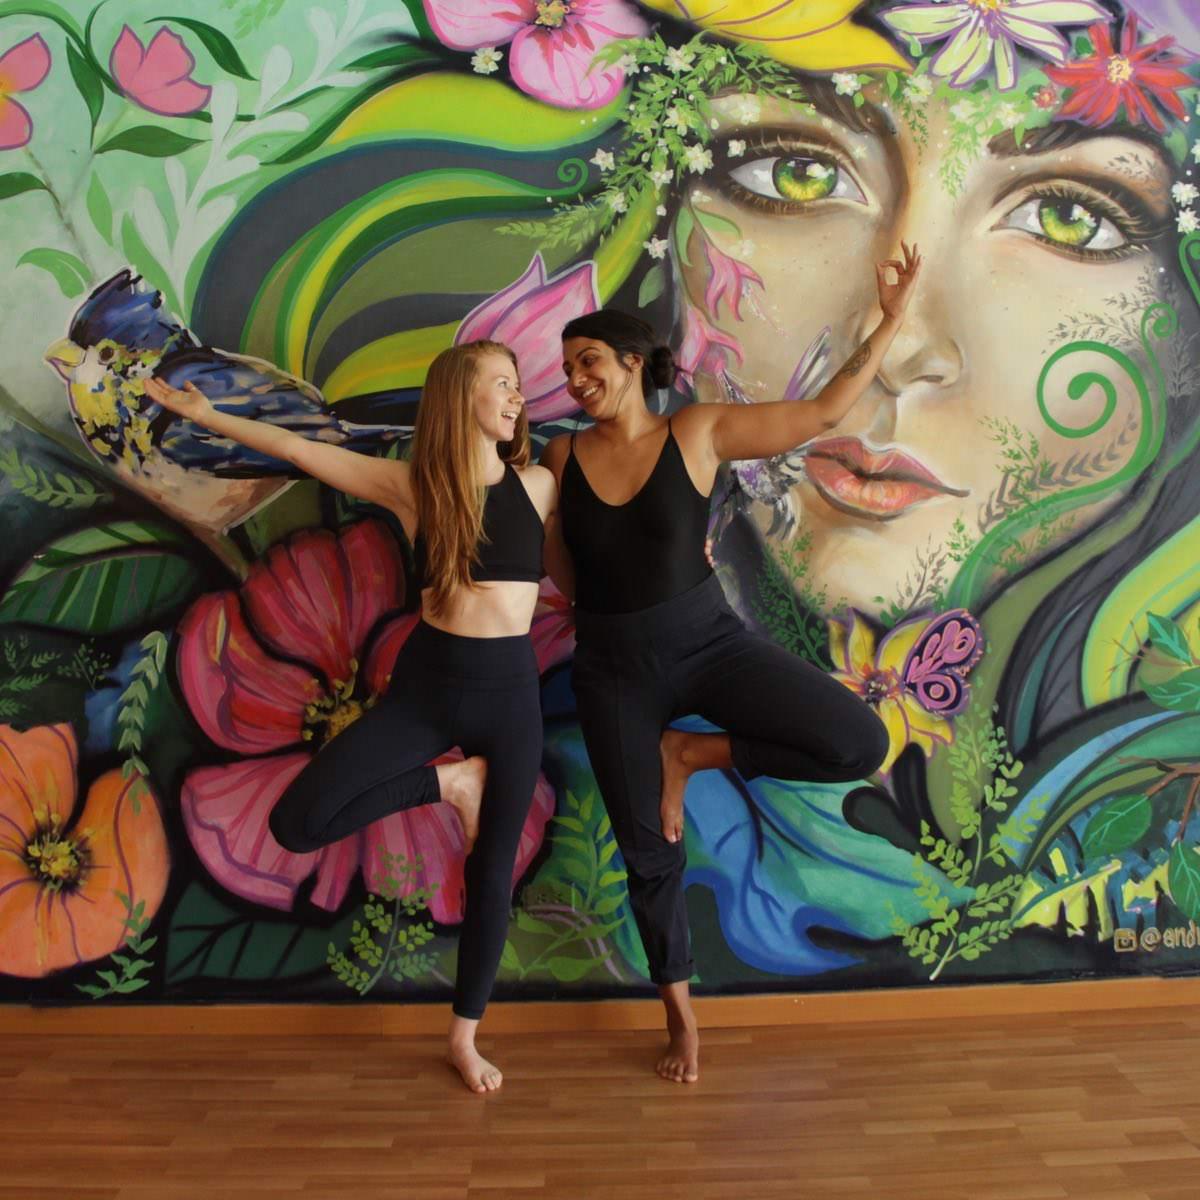 200 hour yoga alliance teacher training Medellin Colombia 3.JPG